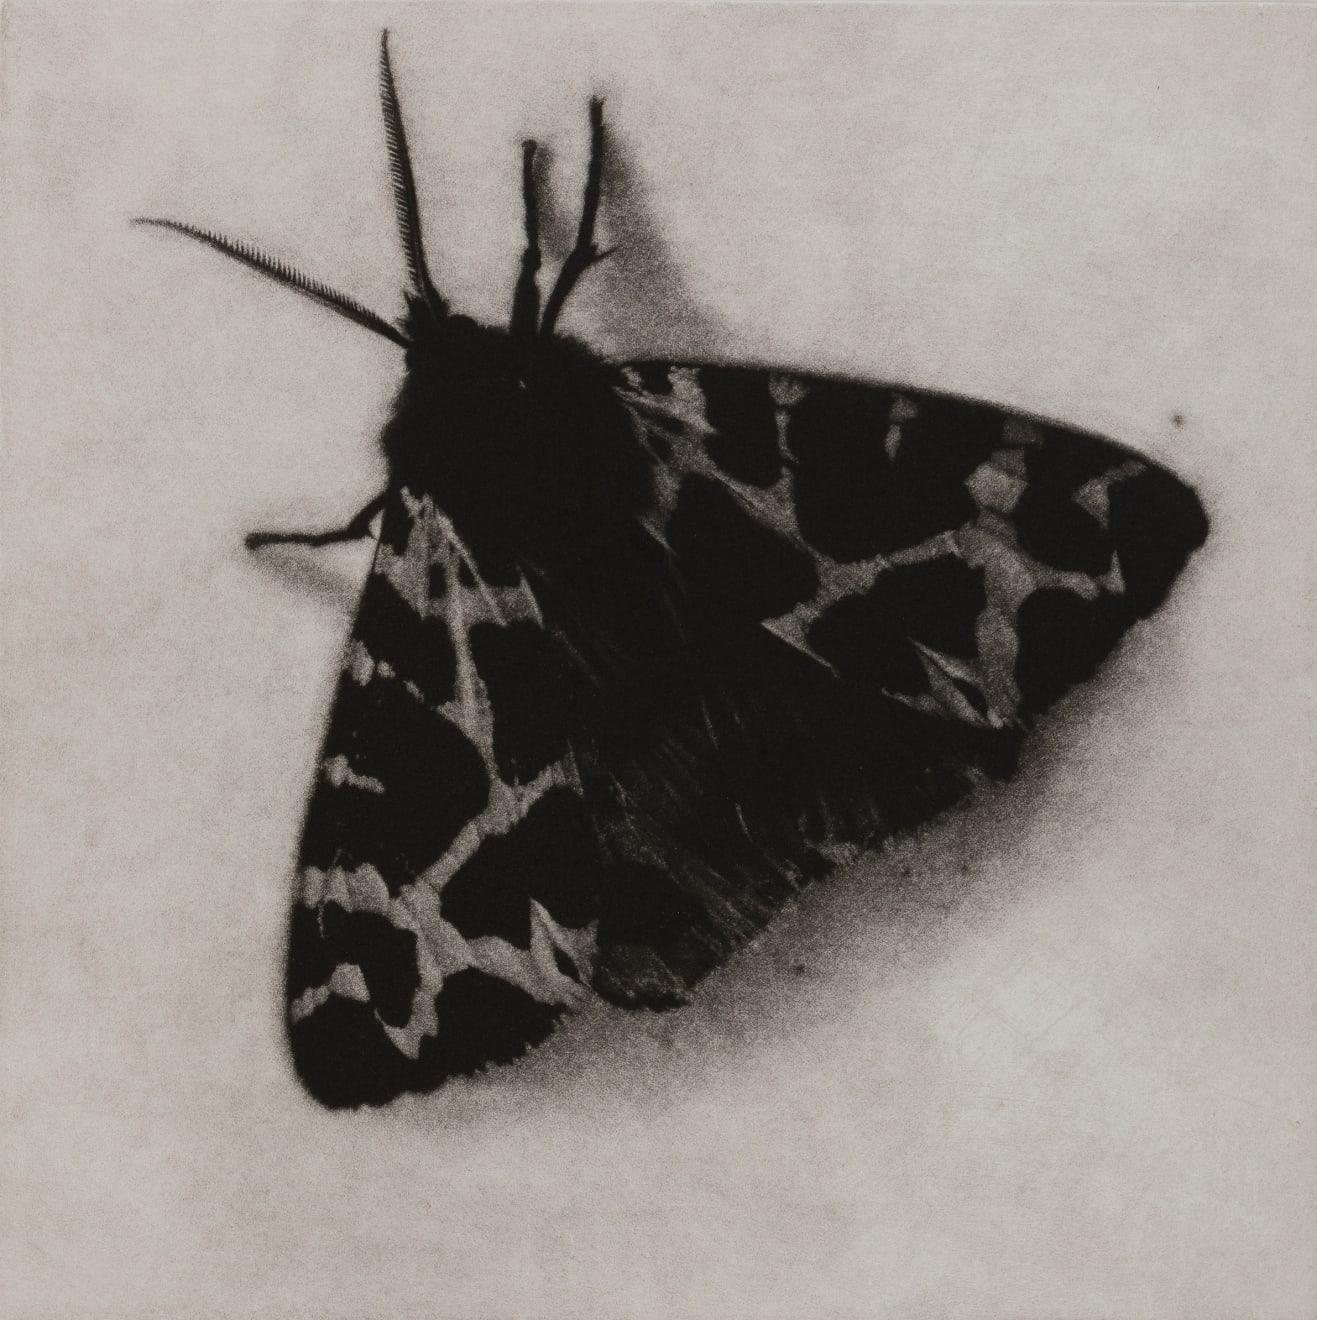 Sarah Gillespie, Garden Tiger Moth, 2019